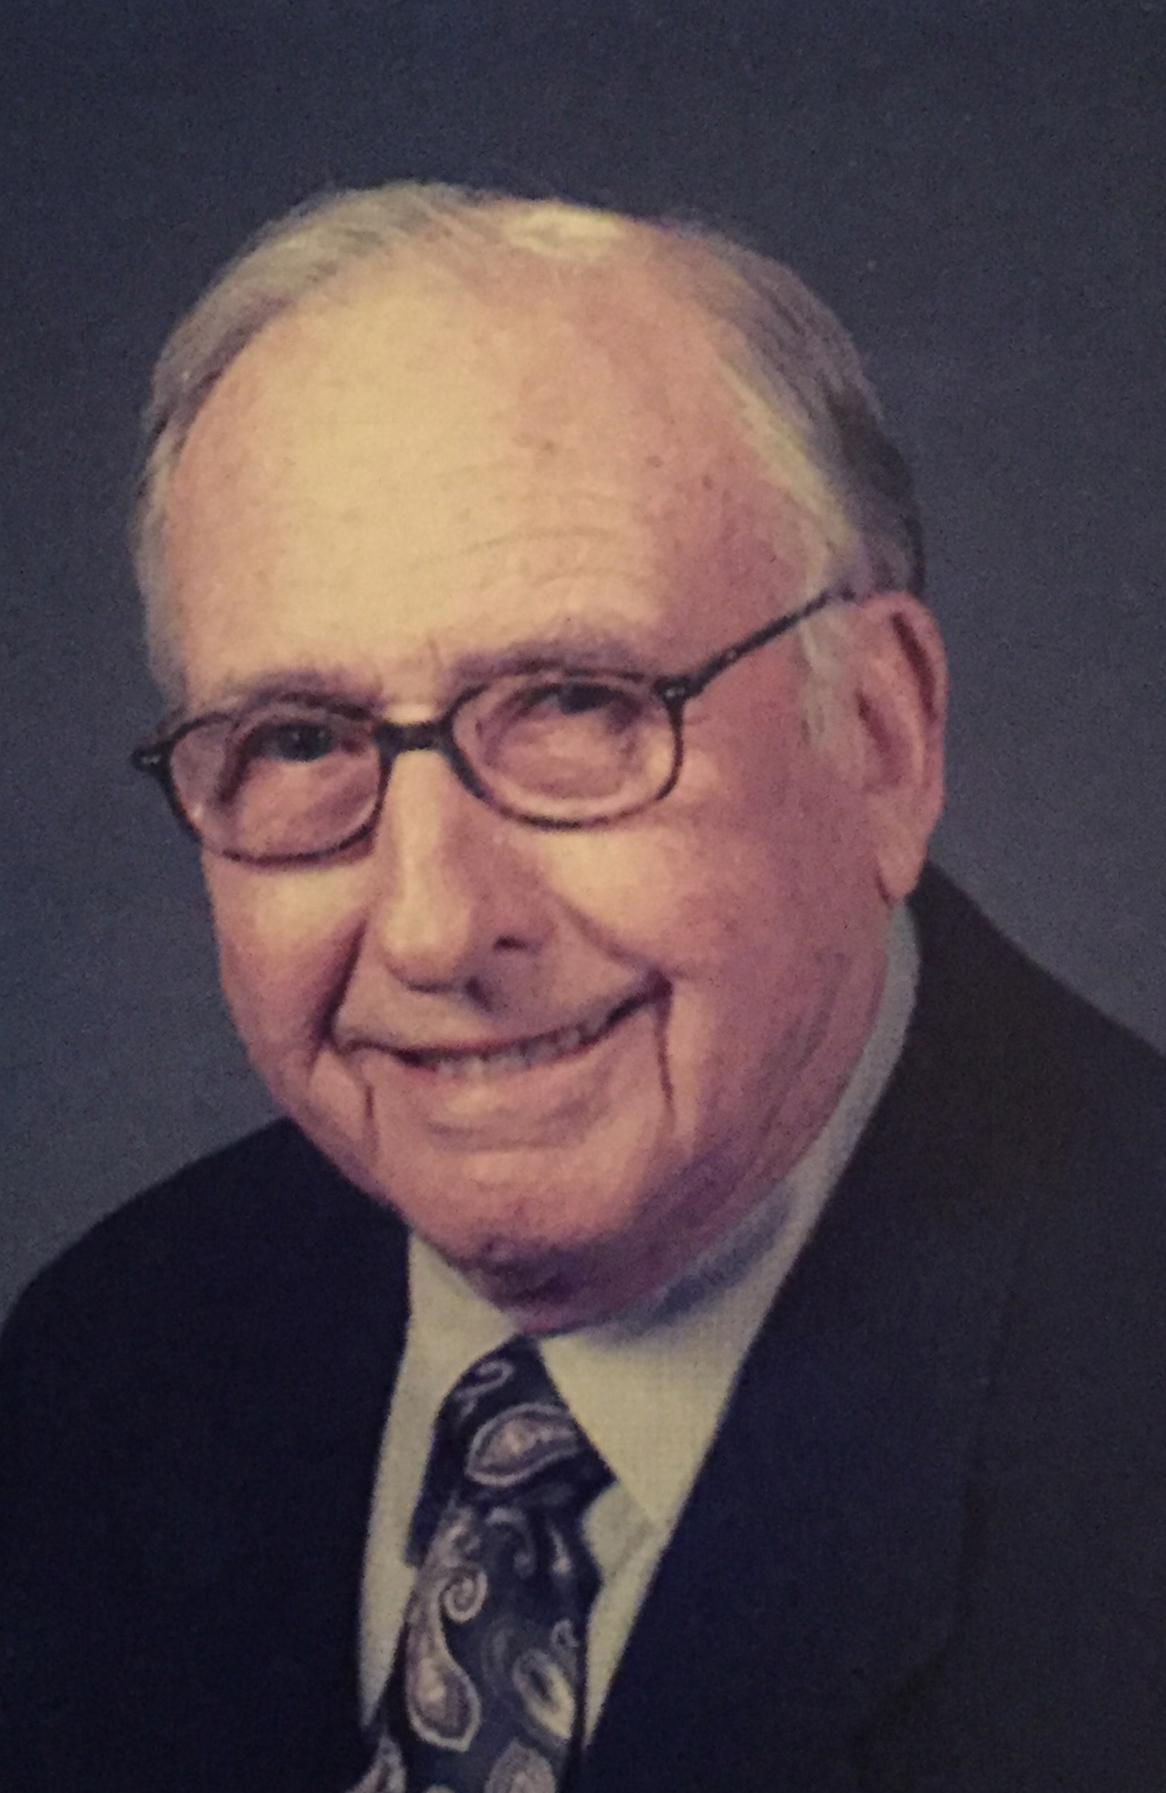 Donald R. Prowant